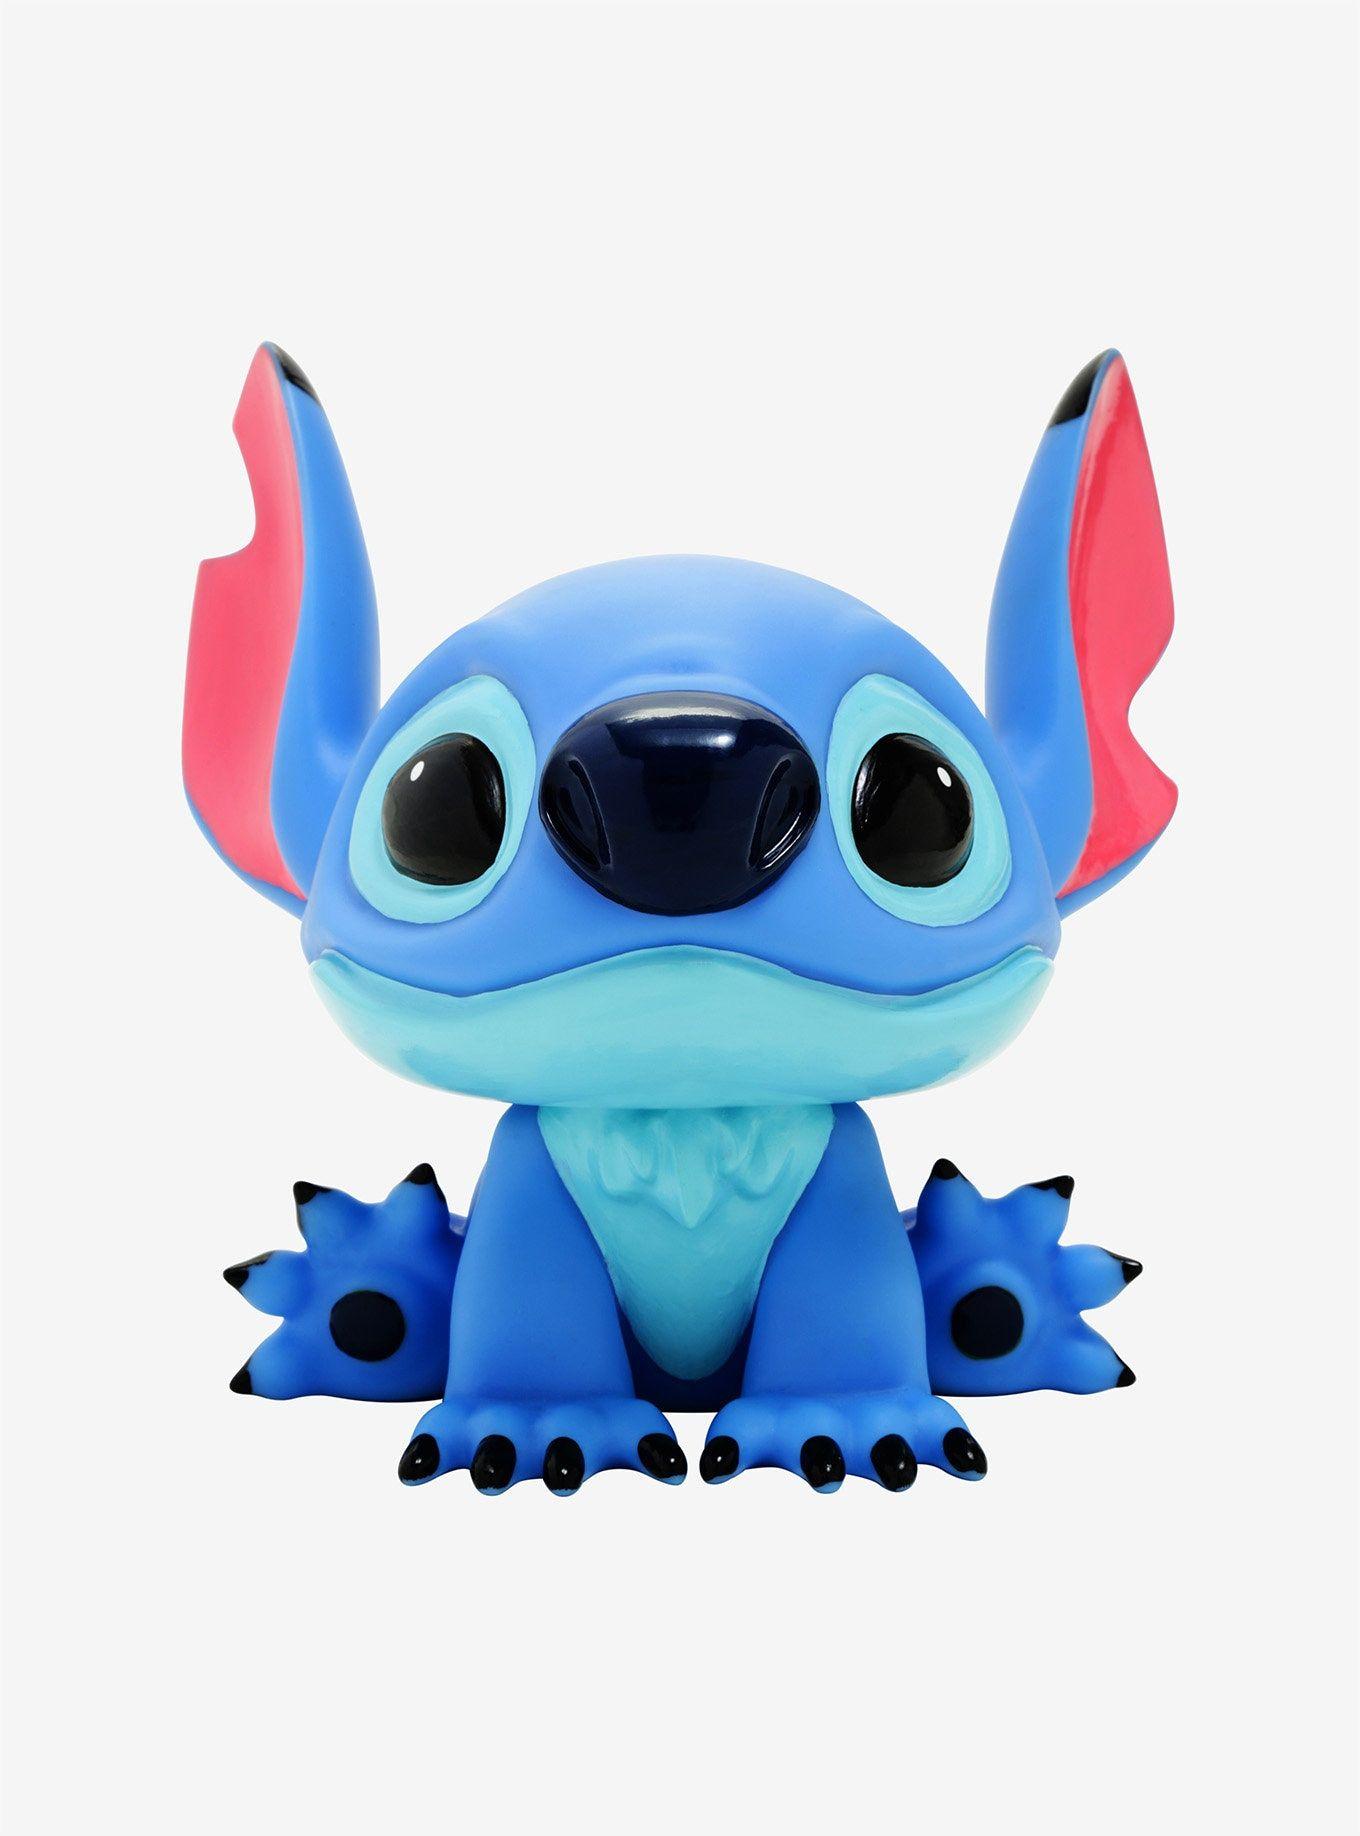 Disney Lilo & Stitch Mood Light BoxLunch Exclusive